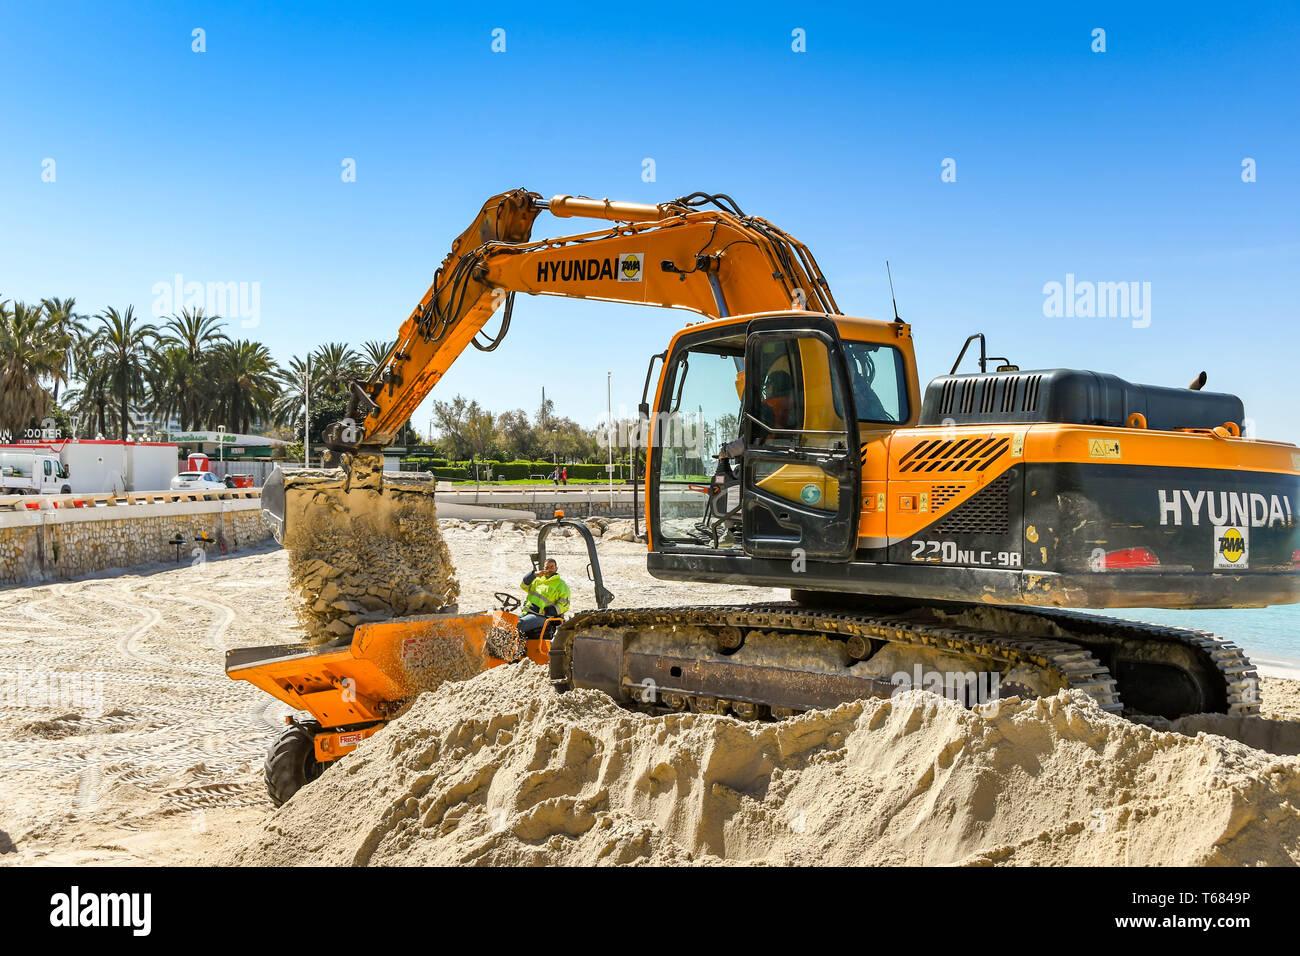 Hyundai Excavator Stock Photos & Hyundai Excavator Stock Images - Alamy